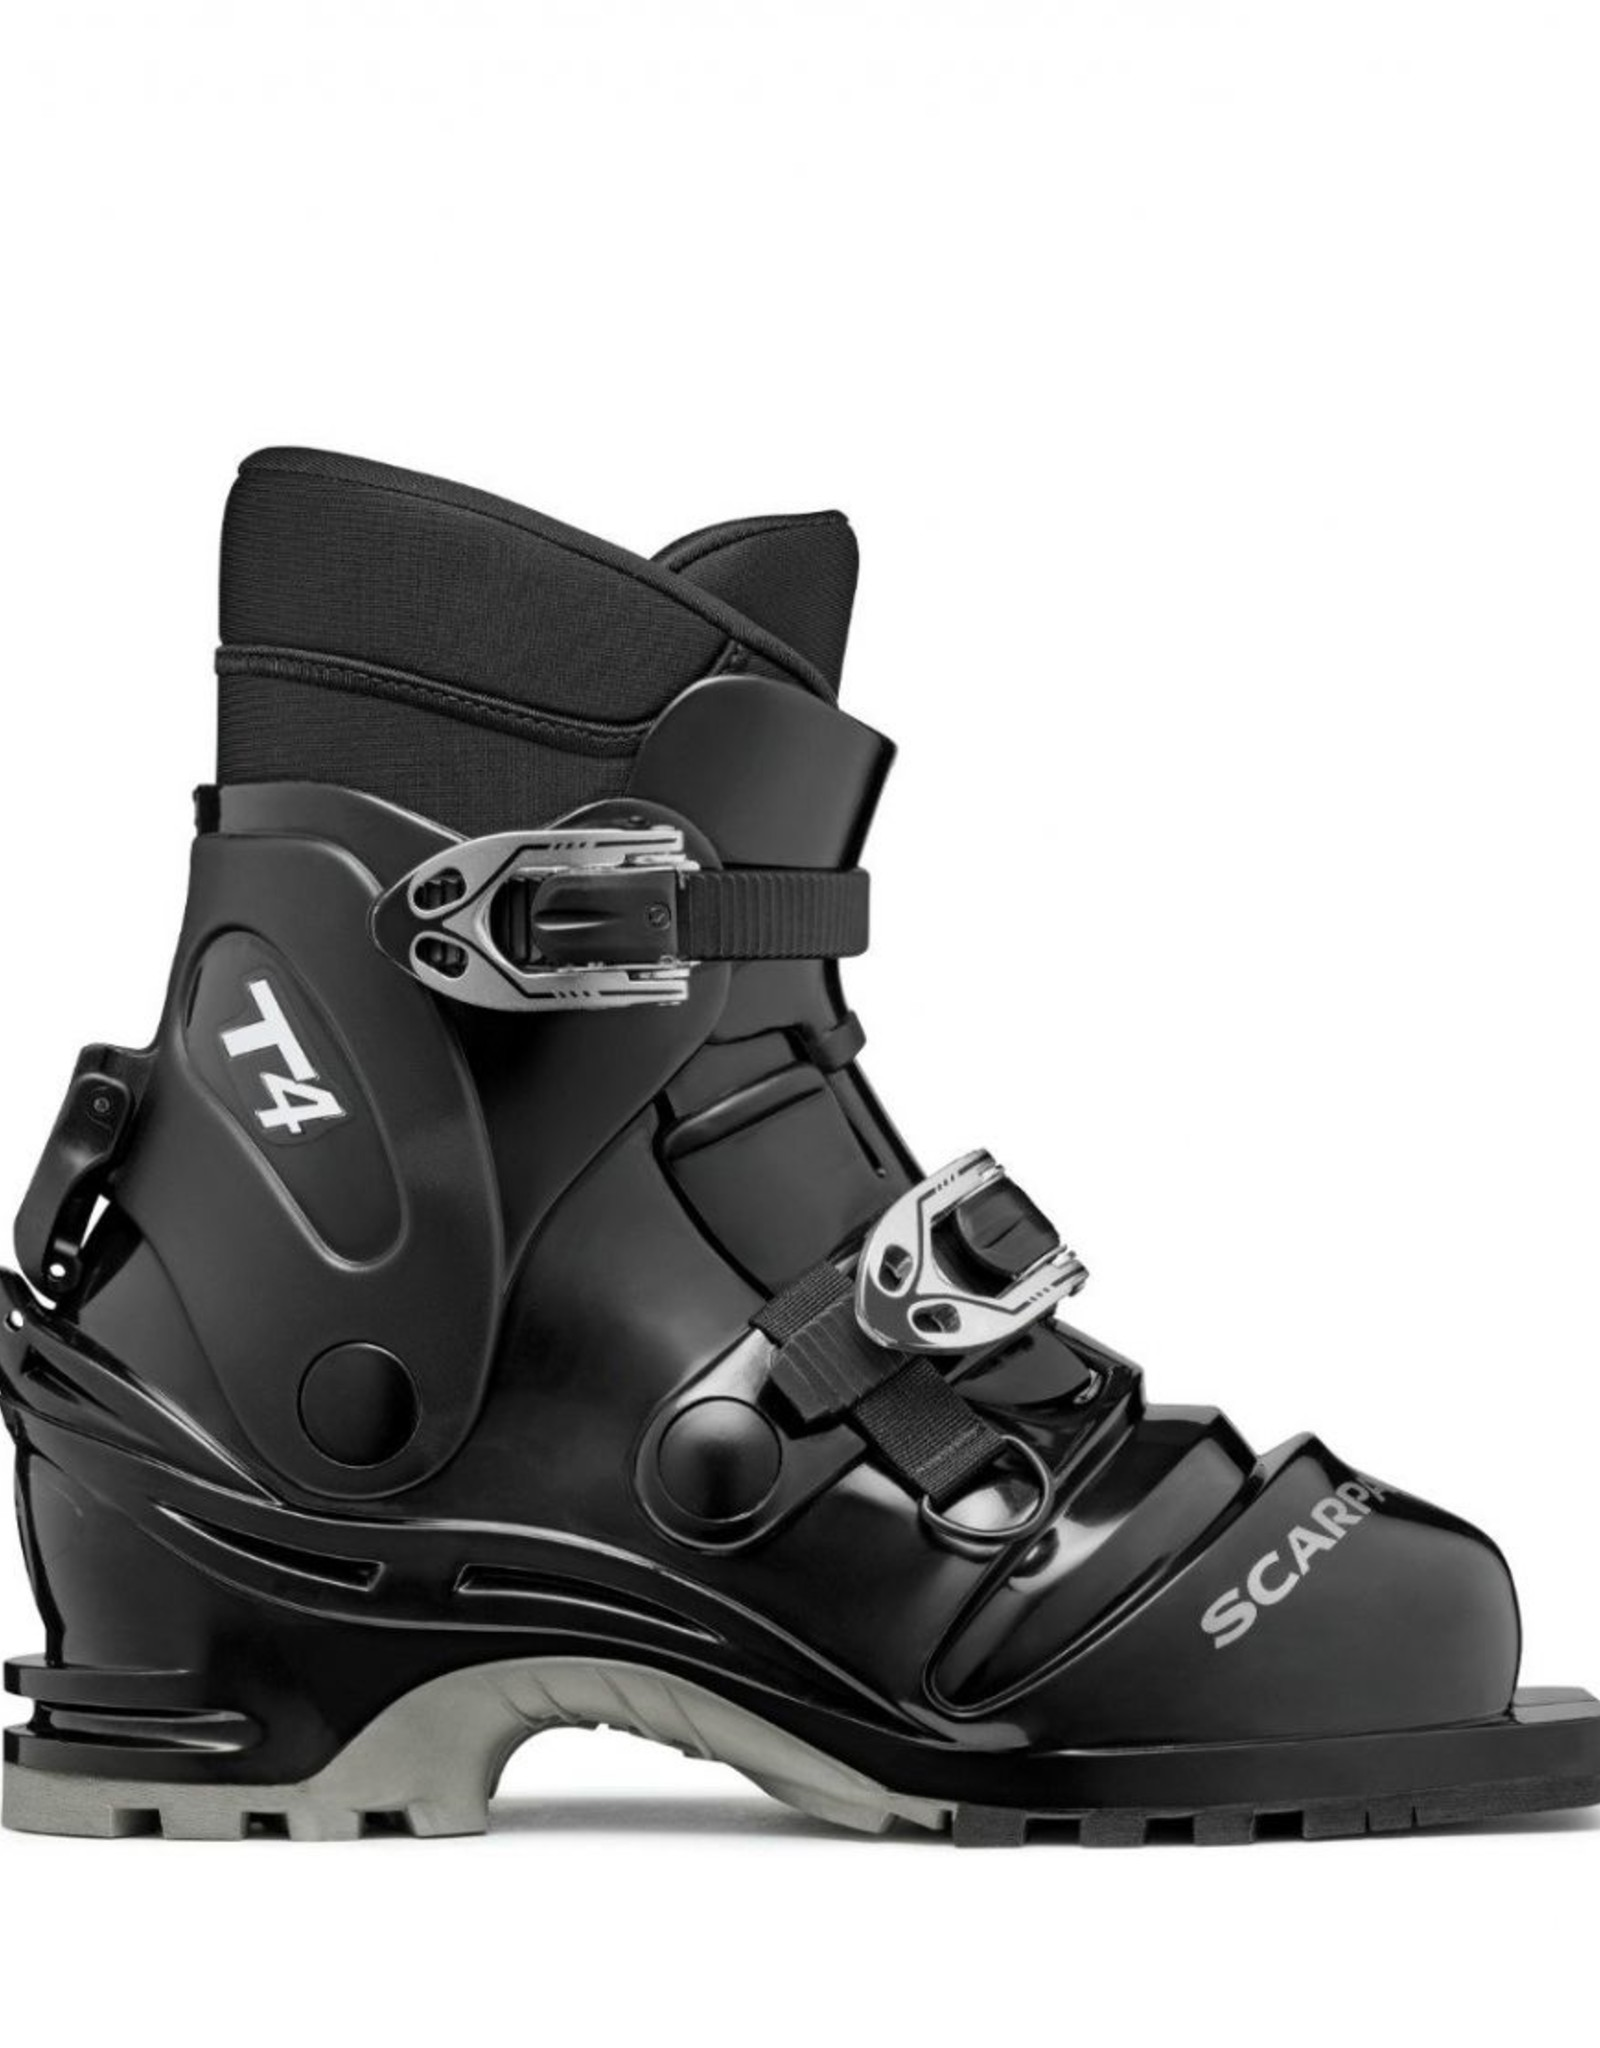 Scarpa Scarpa 2022 T4 Ski Boot w/Thermo Liner